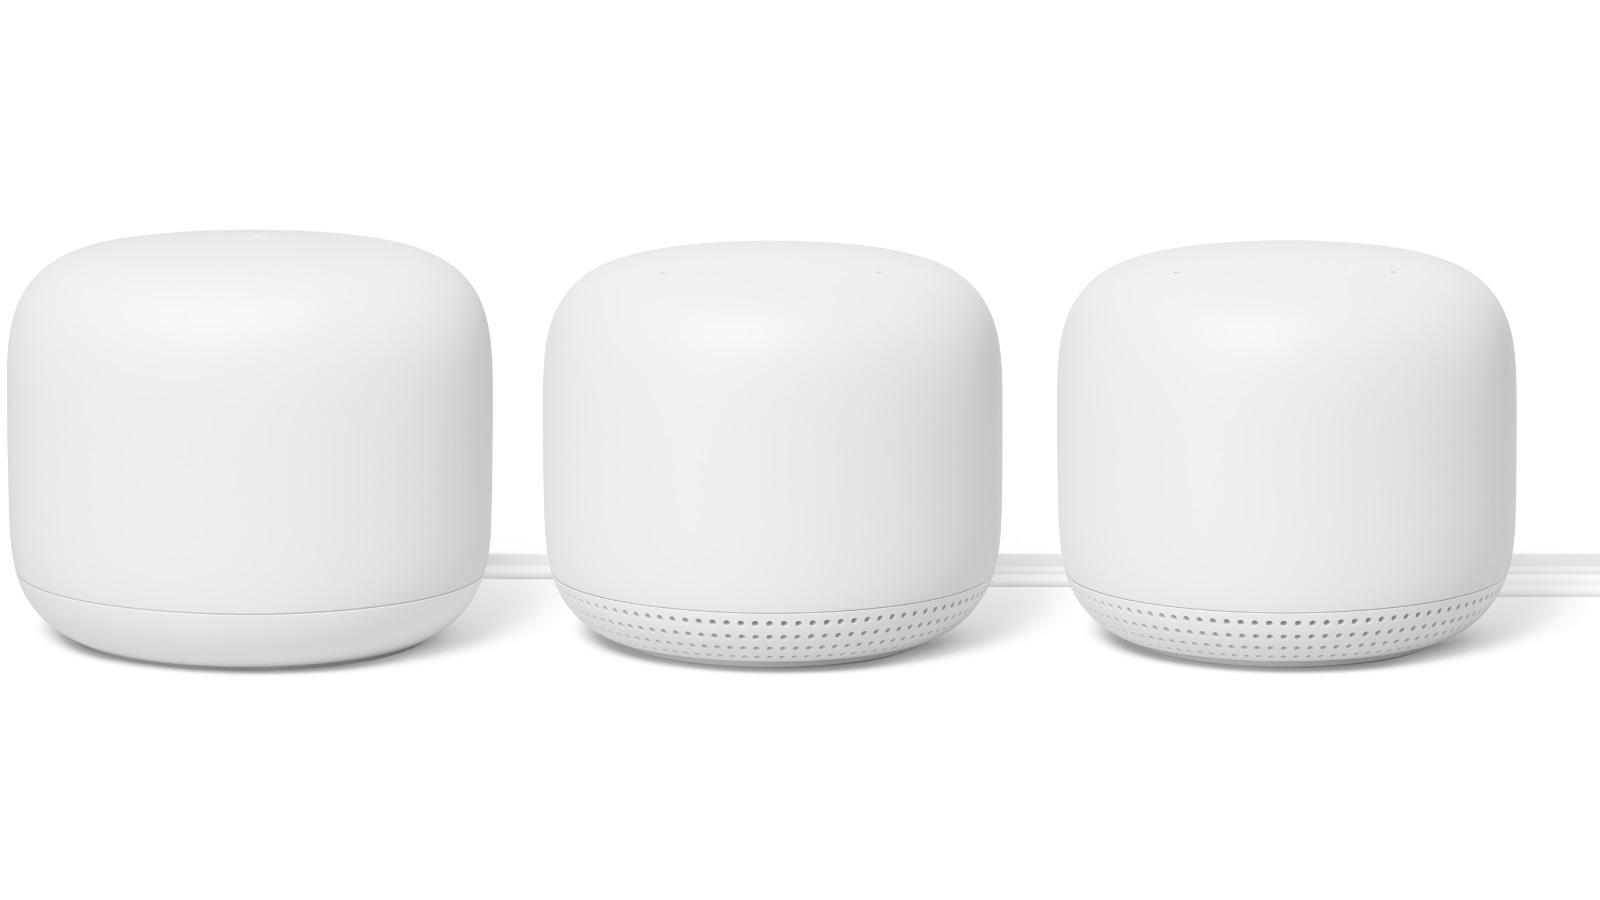 Buy Google Nest WiFi Mesh Router 3 Pack | Harvey Norman AU